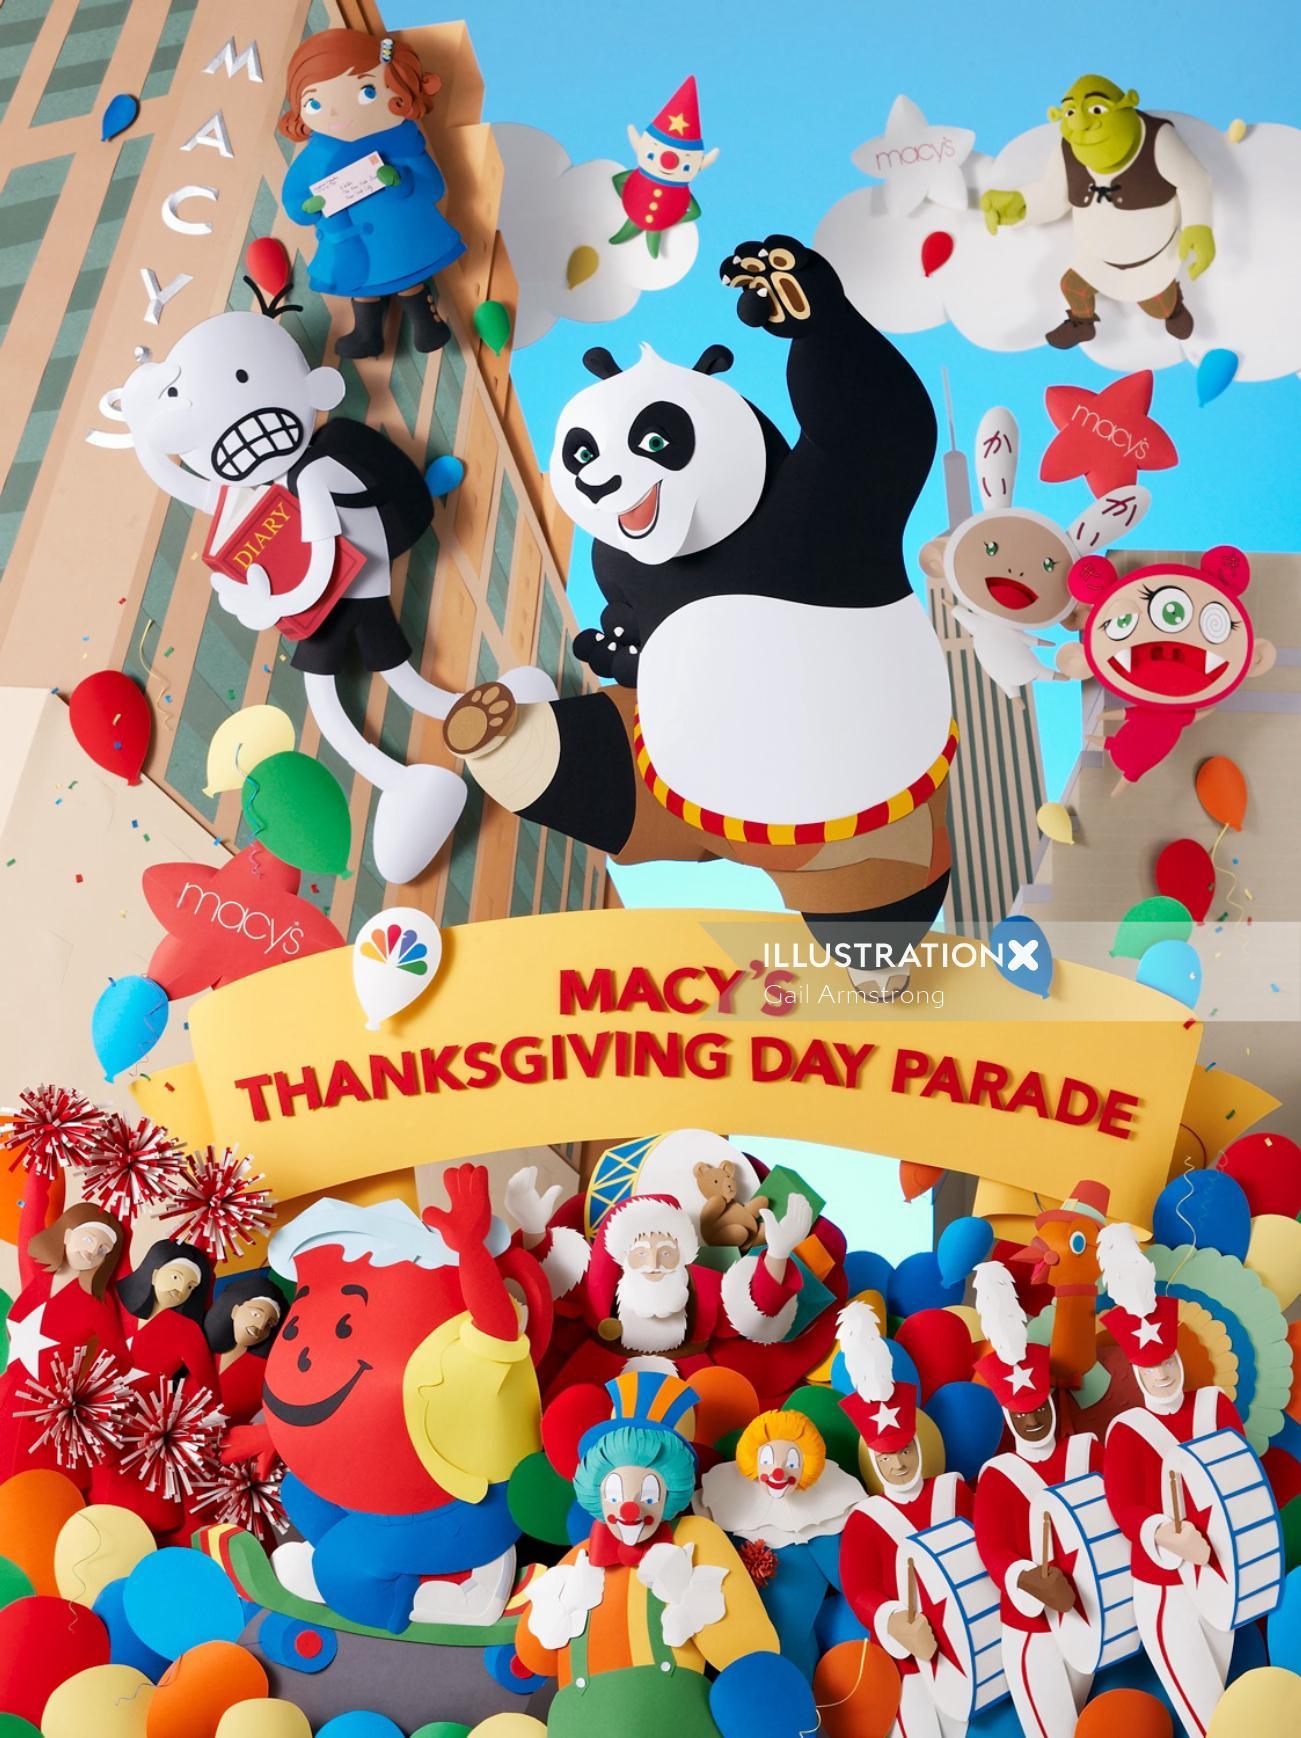 84th Macy's Thanksgiving Day Parade with Kung fu Panda, Shrek and Whimpy Kid